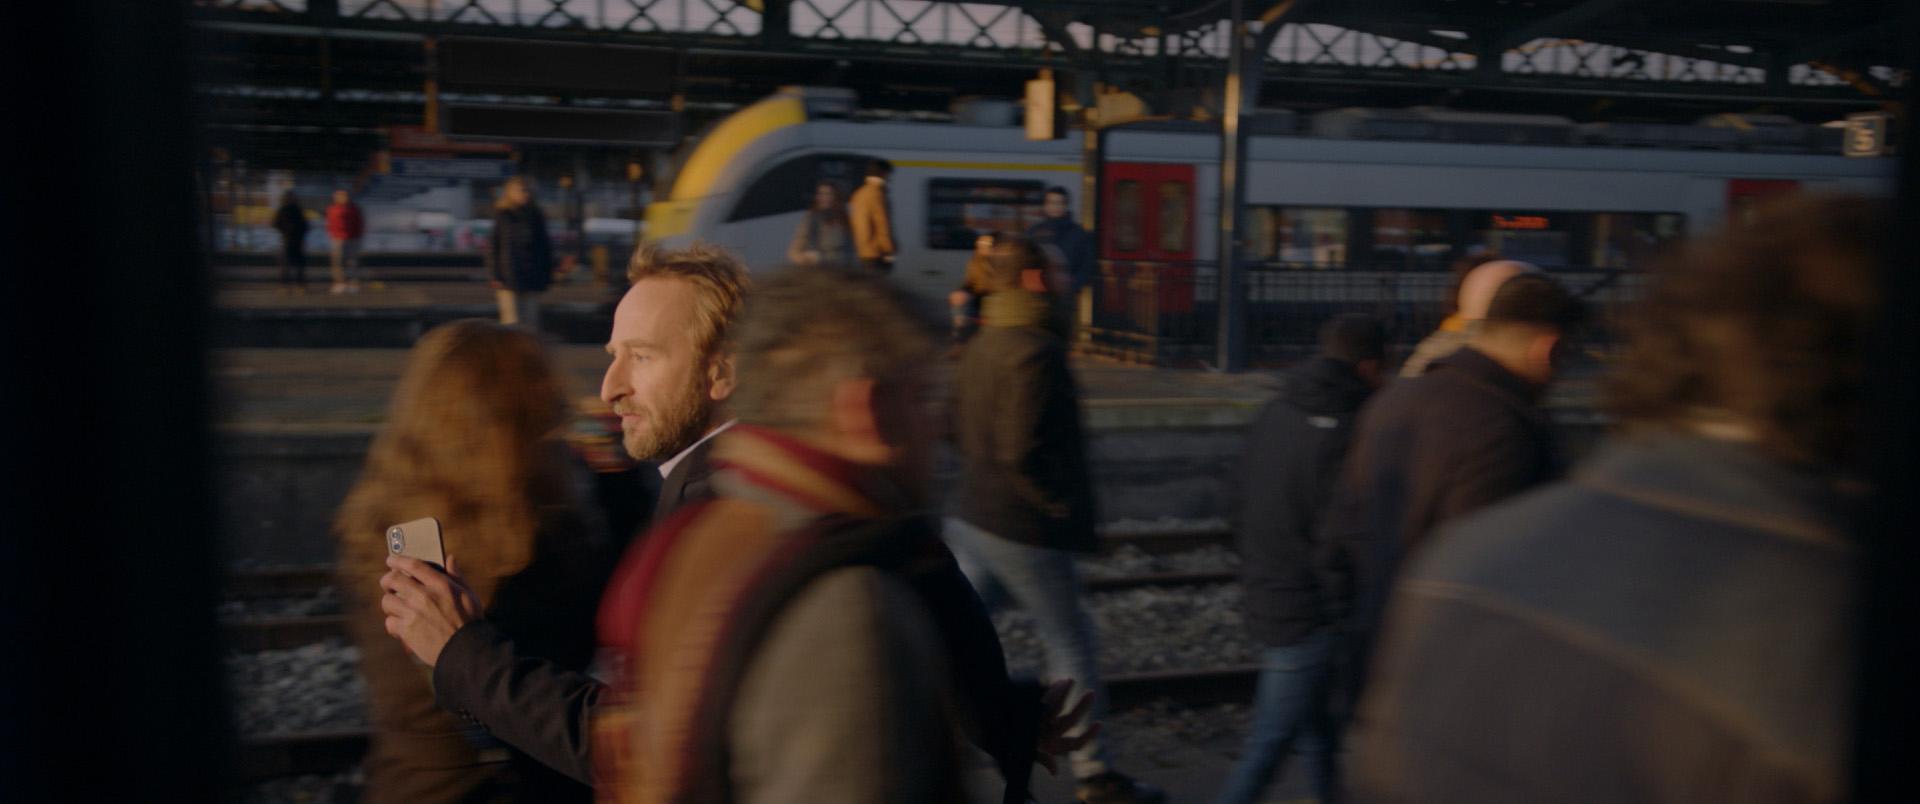 peu_prom_trainstation_30s_VF_web_v030_mix_open-0550